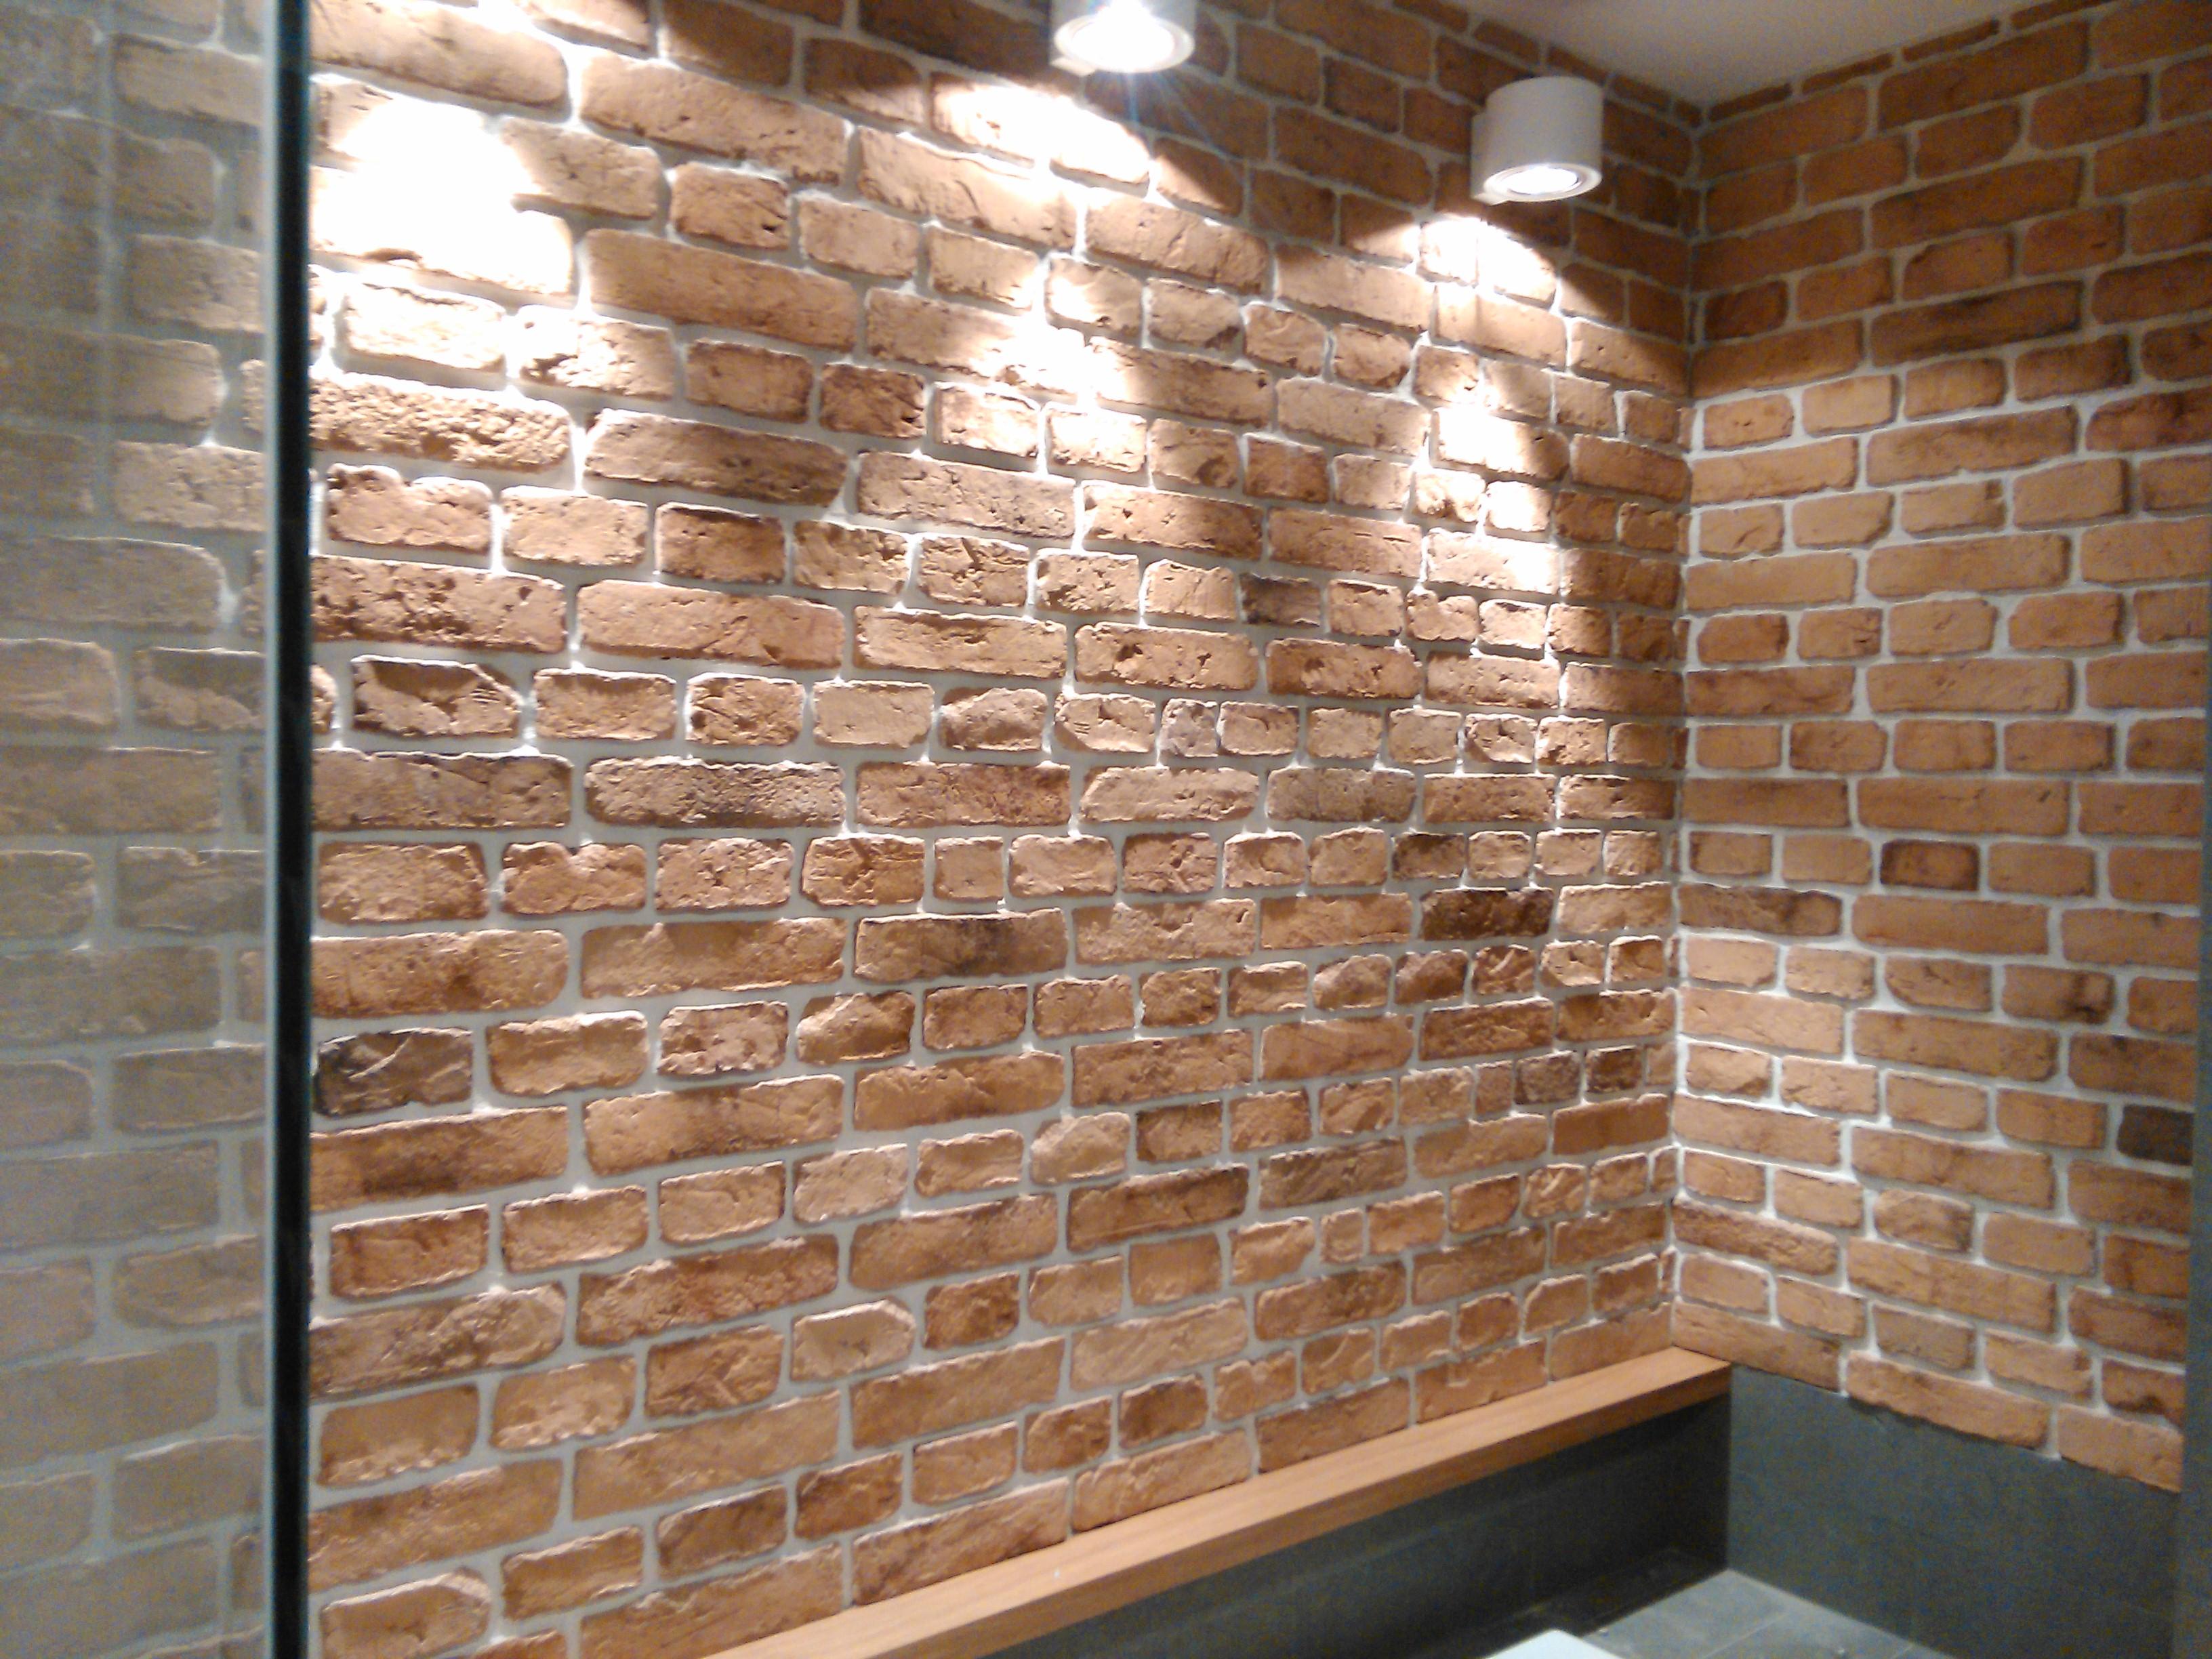 Brick Veneer Tile : Brick veneers cladding alternative uk feature walls